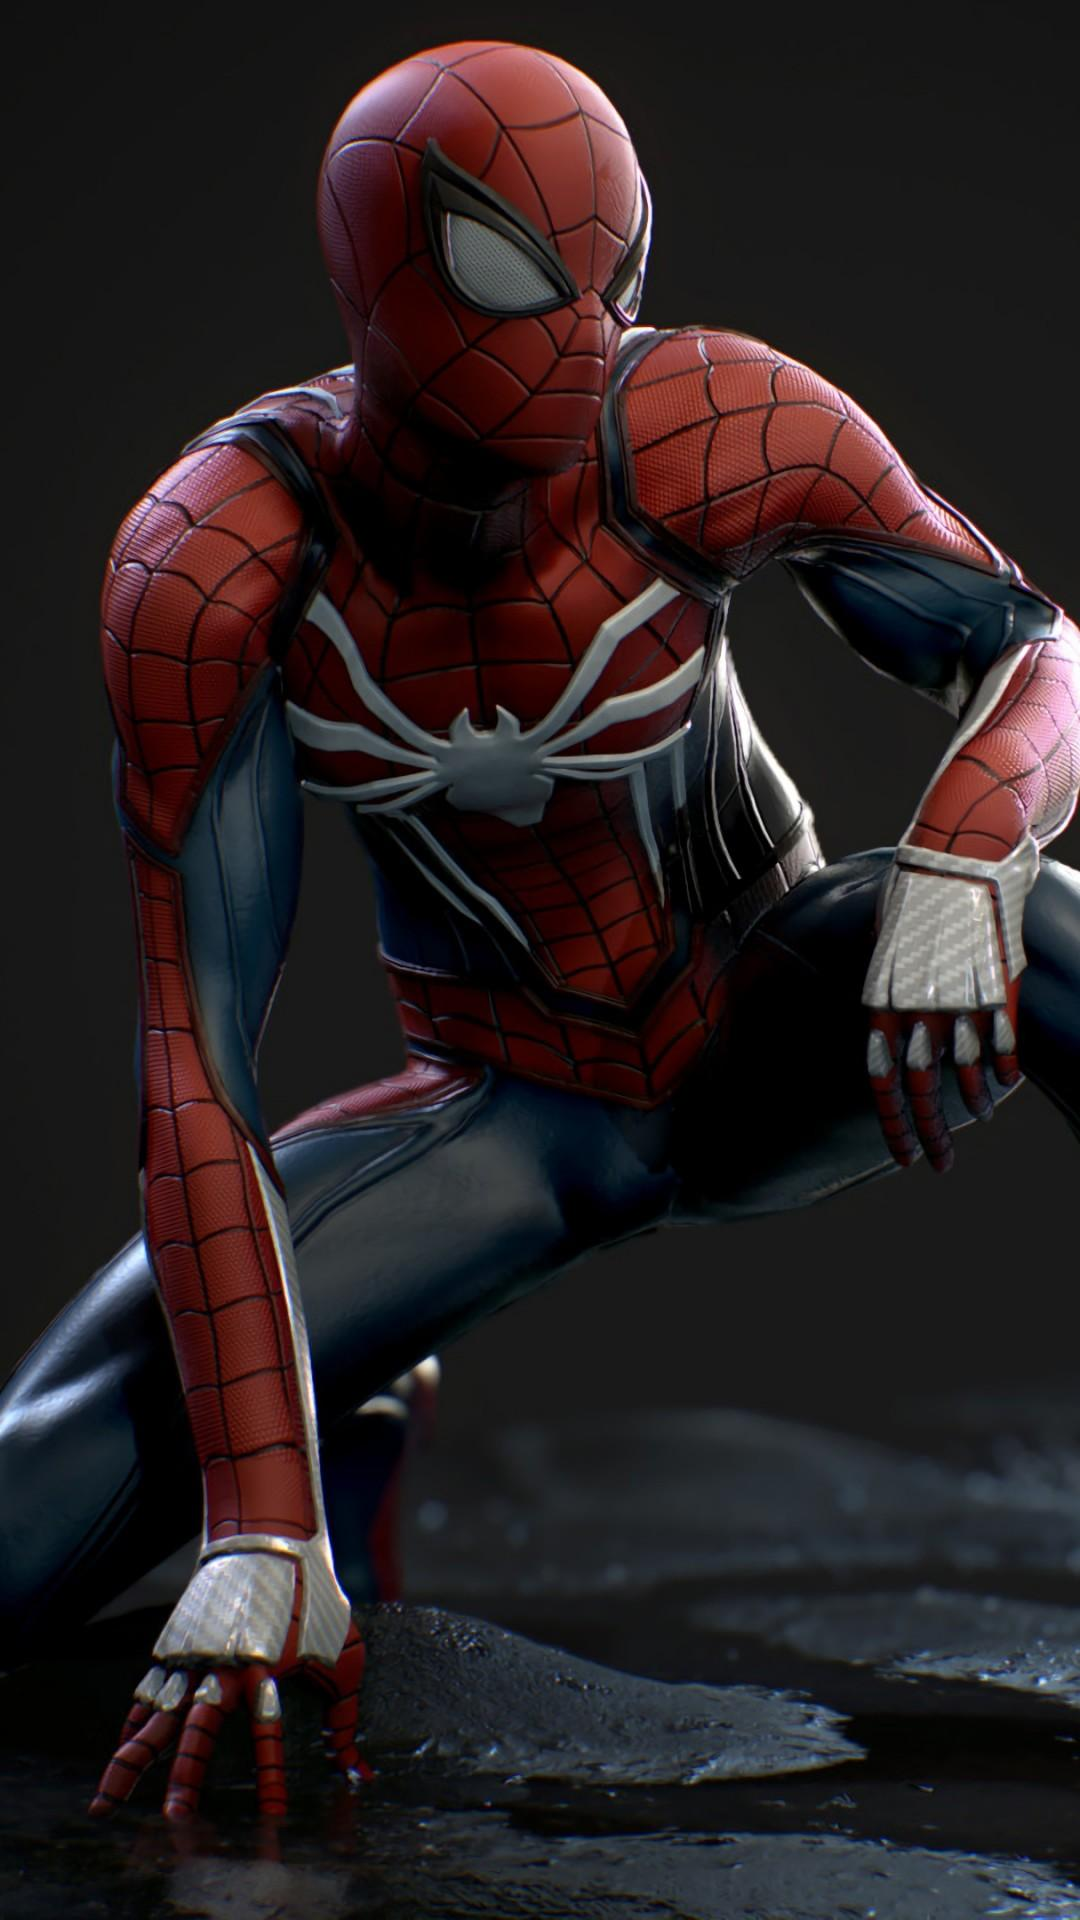 Spider Man 4k iPhone Wallpapers - Wallpaper Cave